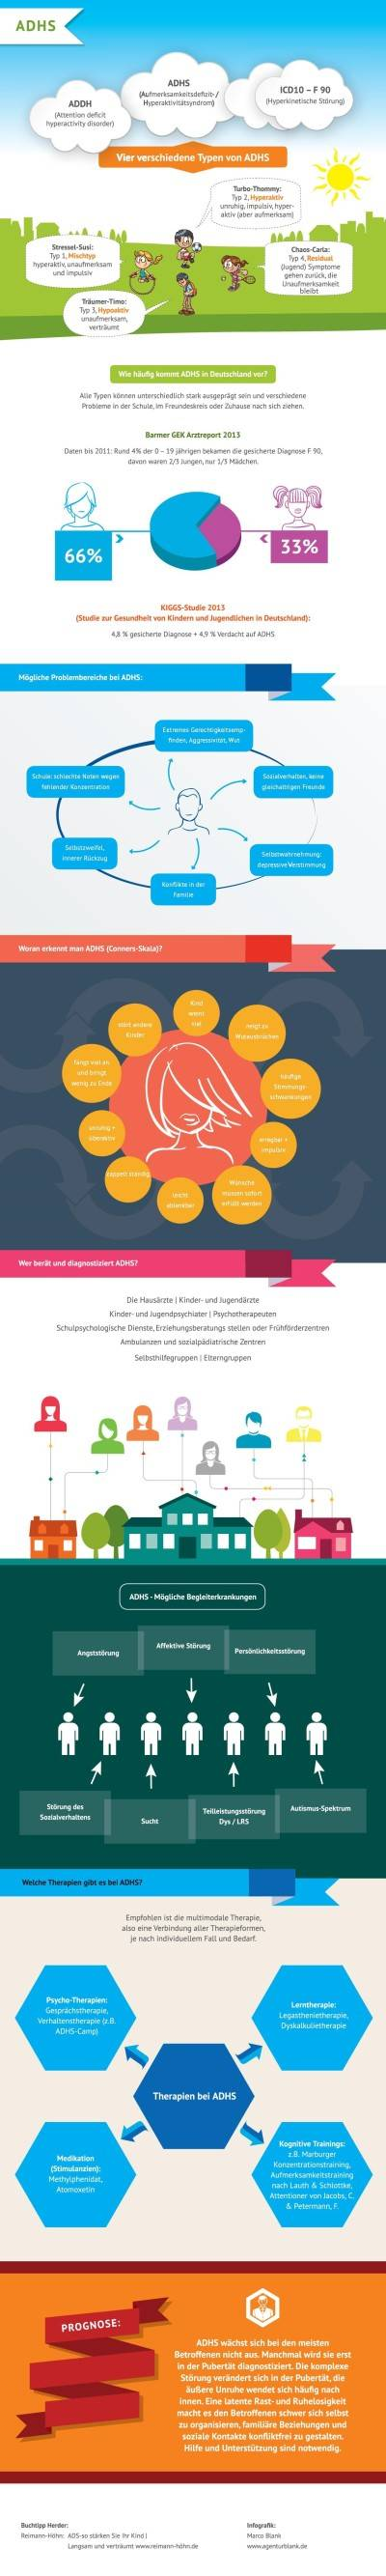 infografik adhs